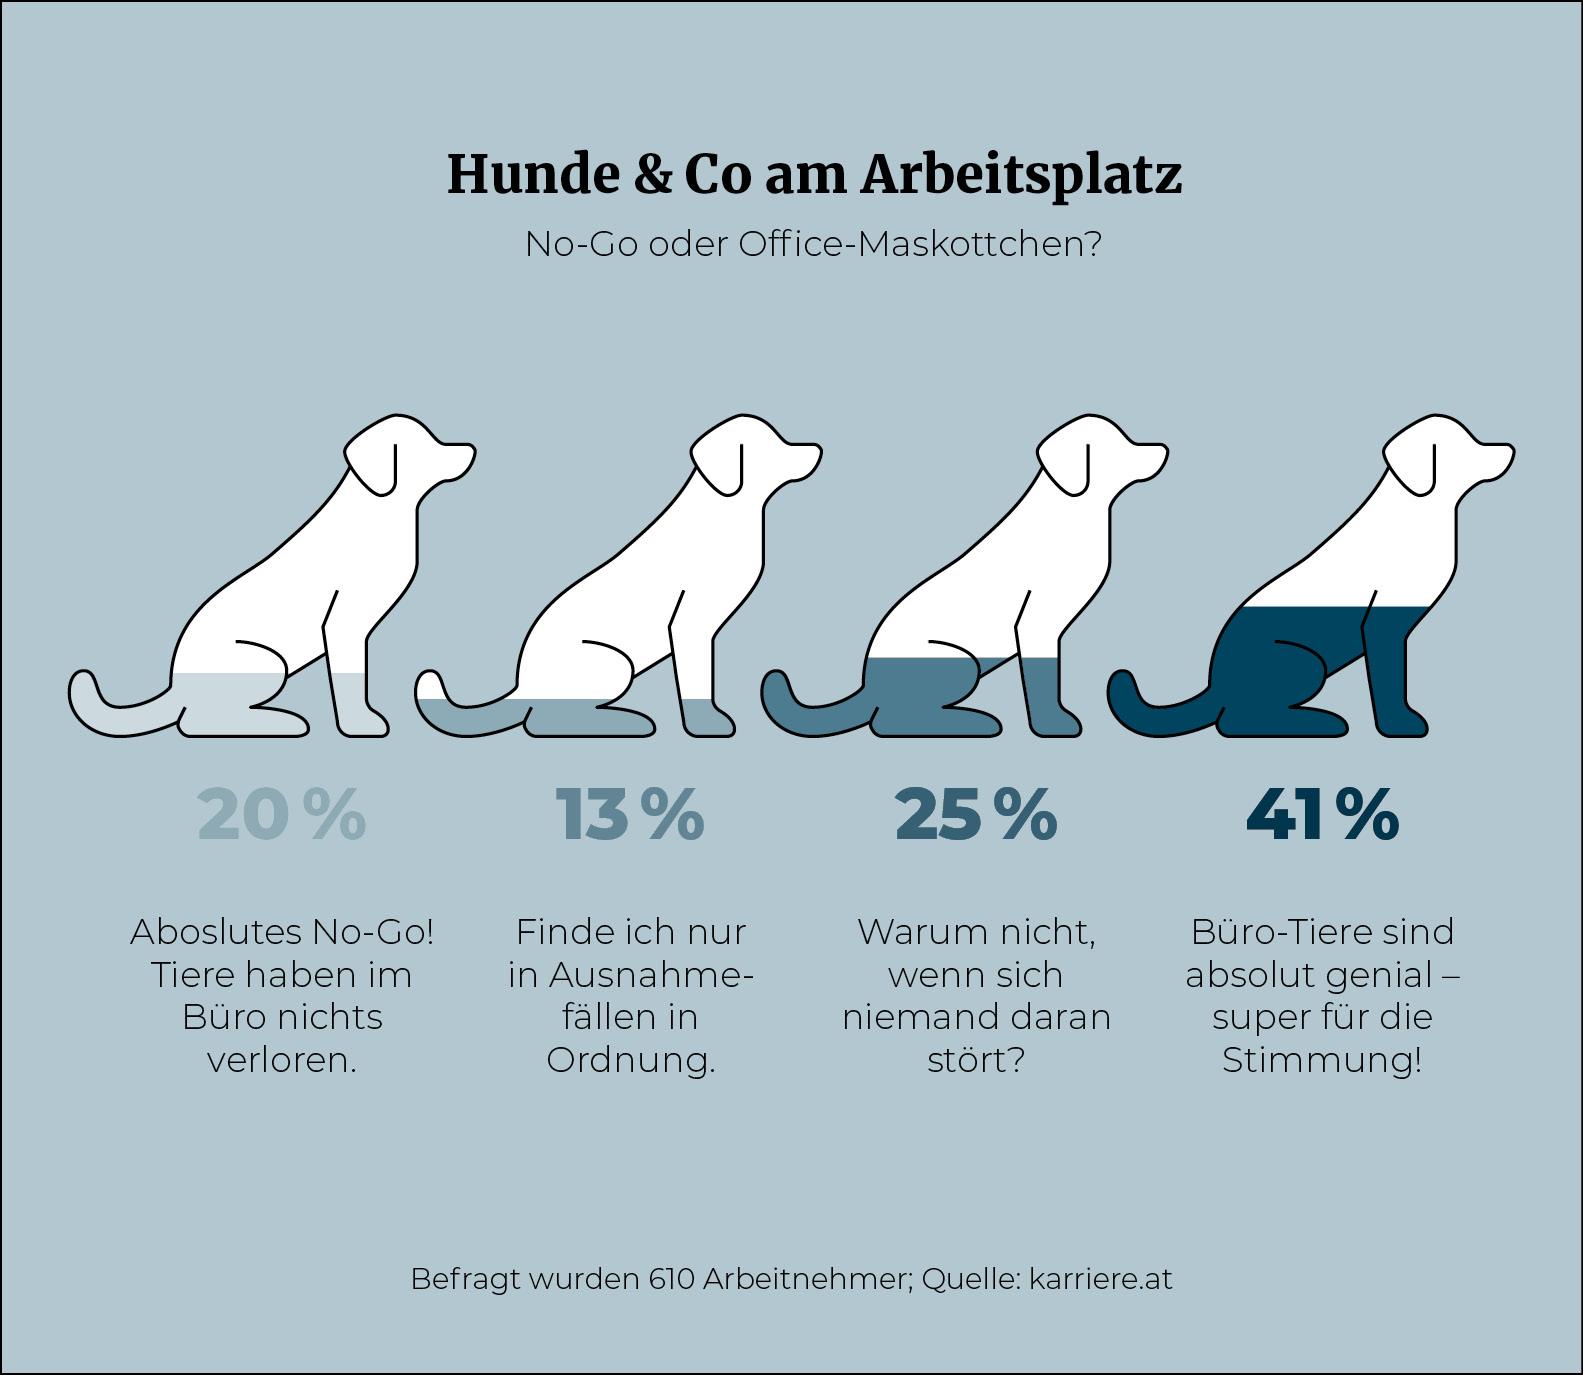 Hund_am_Arbeitsplatz_Infografik